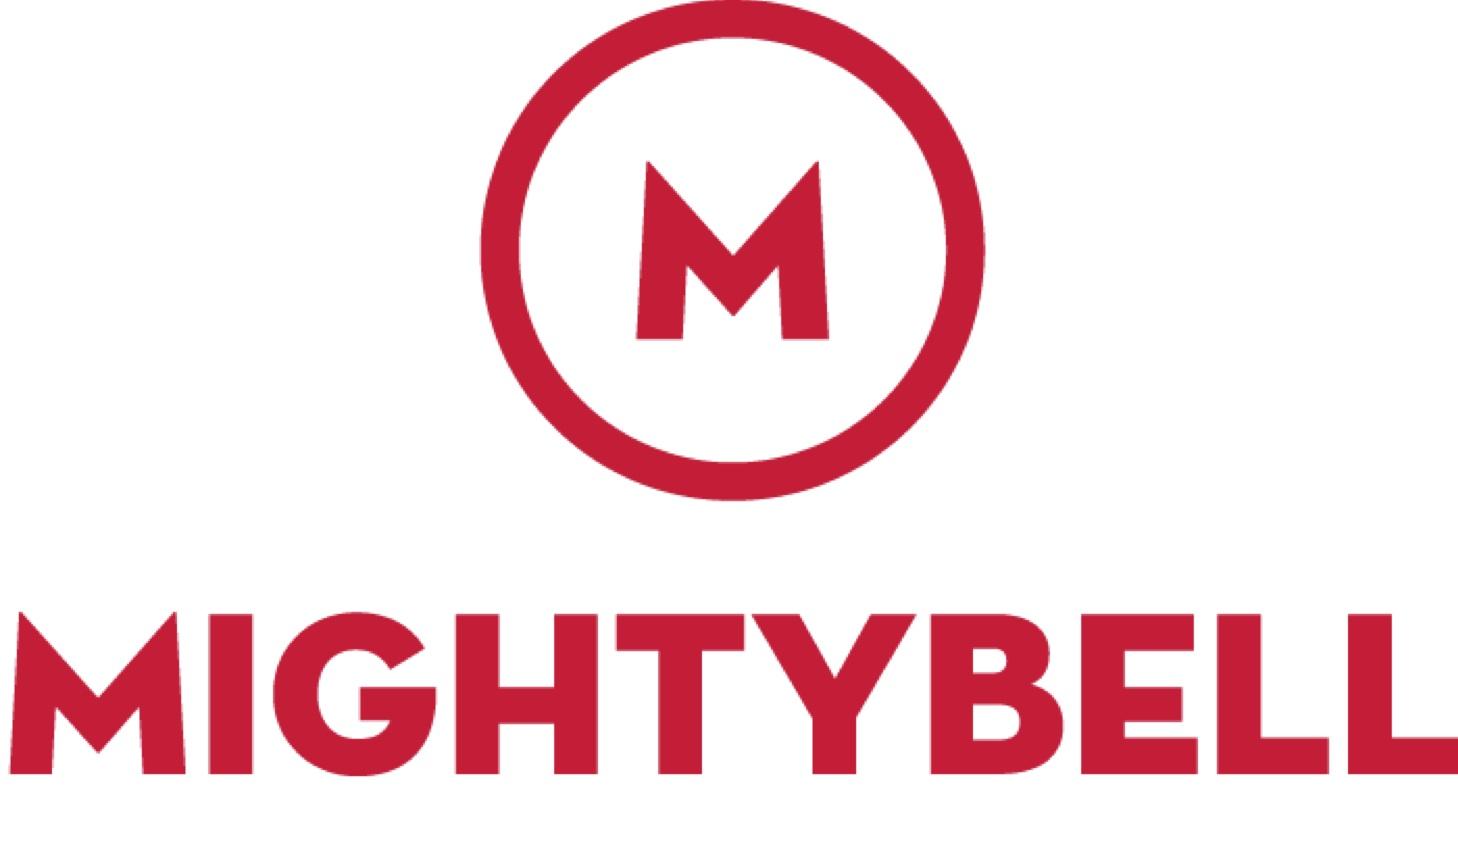 mightybell_logo copy